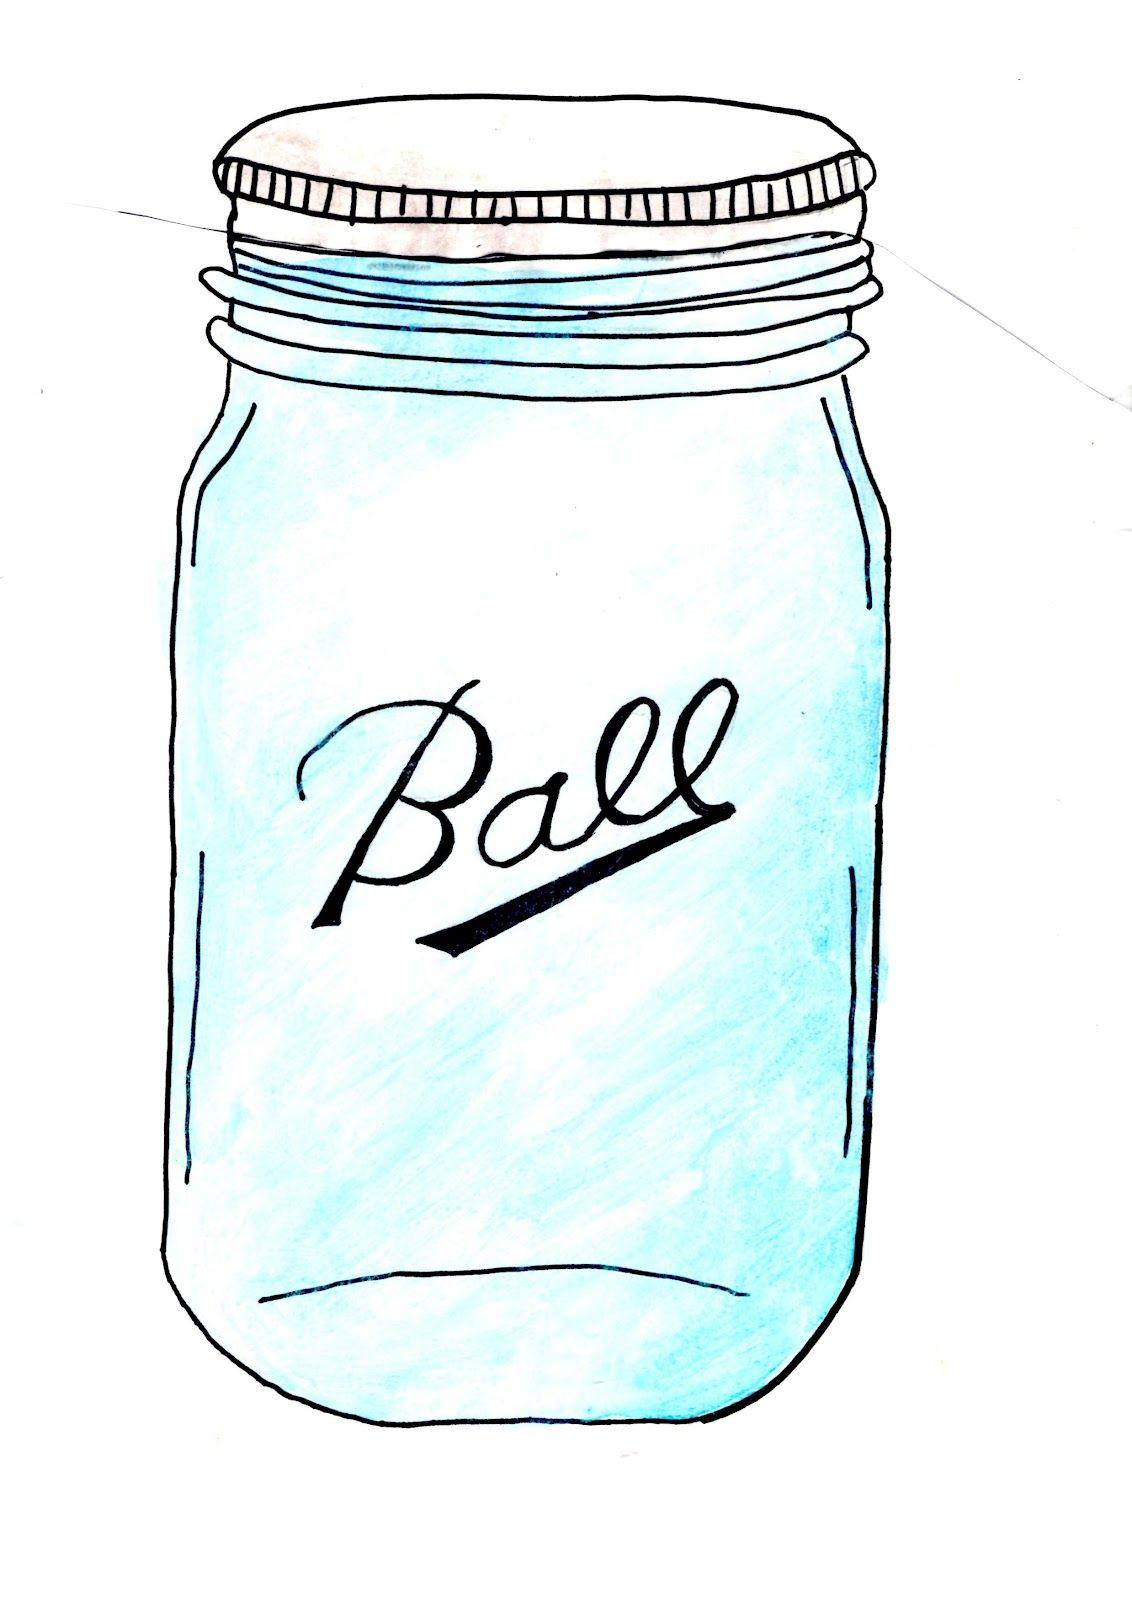 Free mason jar clipart image black and white download free mason jar clip art | Freebies | Mason jar clip art, Mason jar ... image black and white download